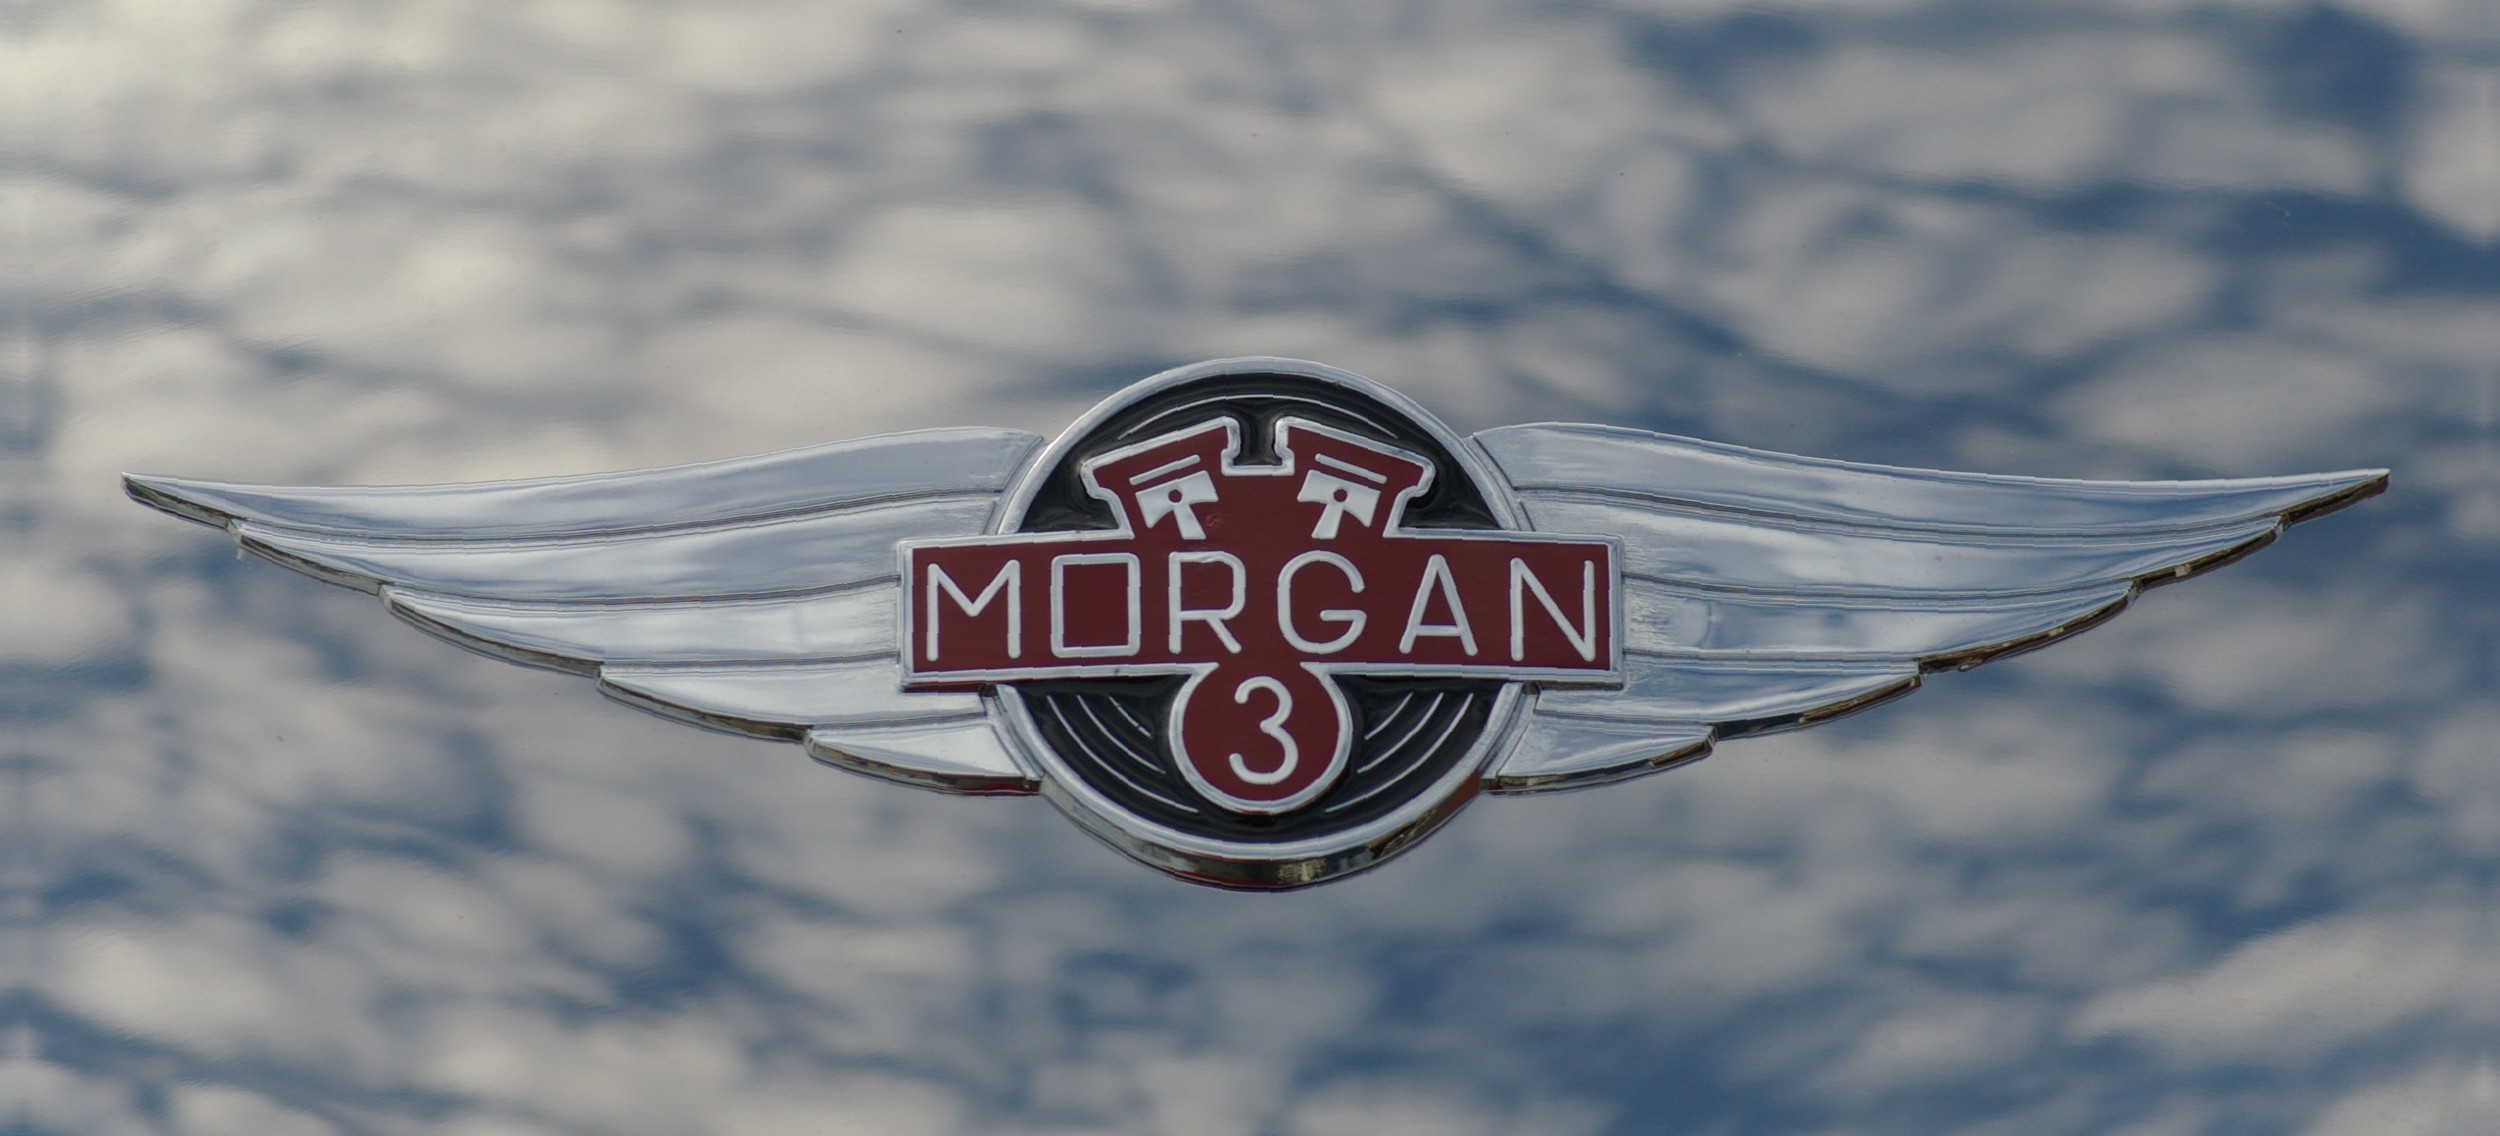 Morggan_1.jpg